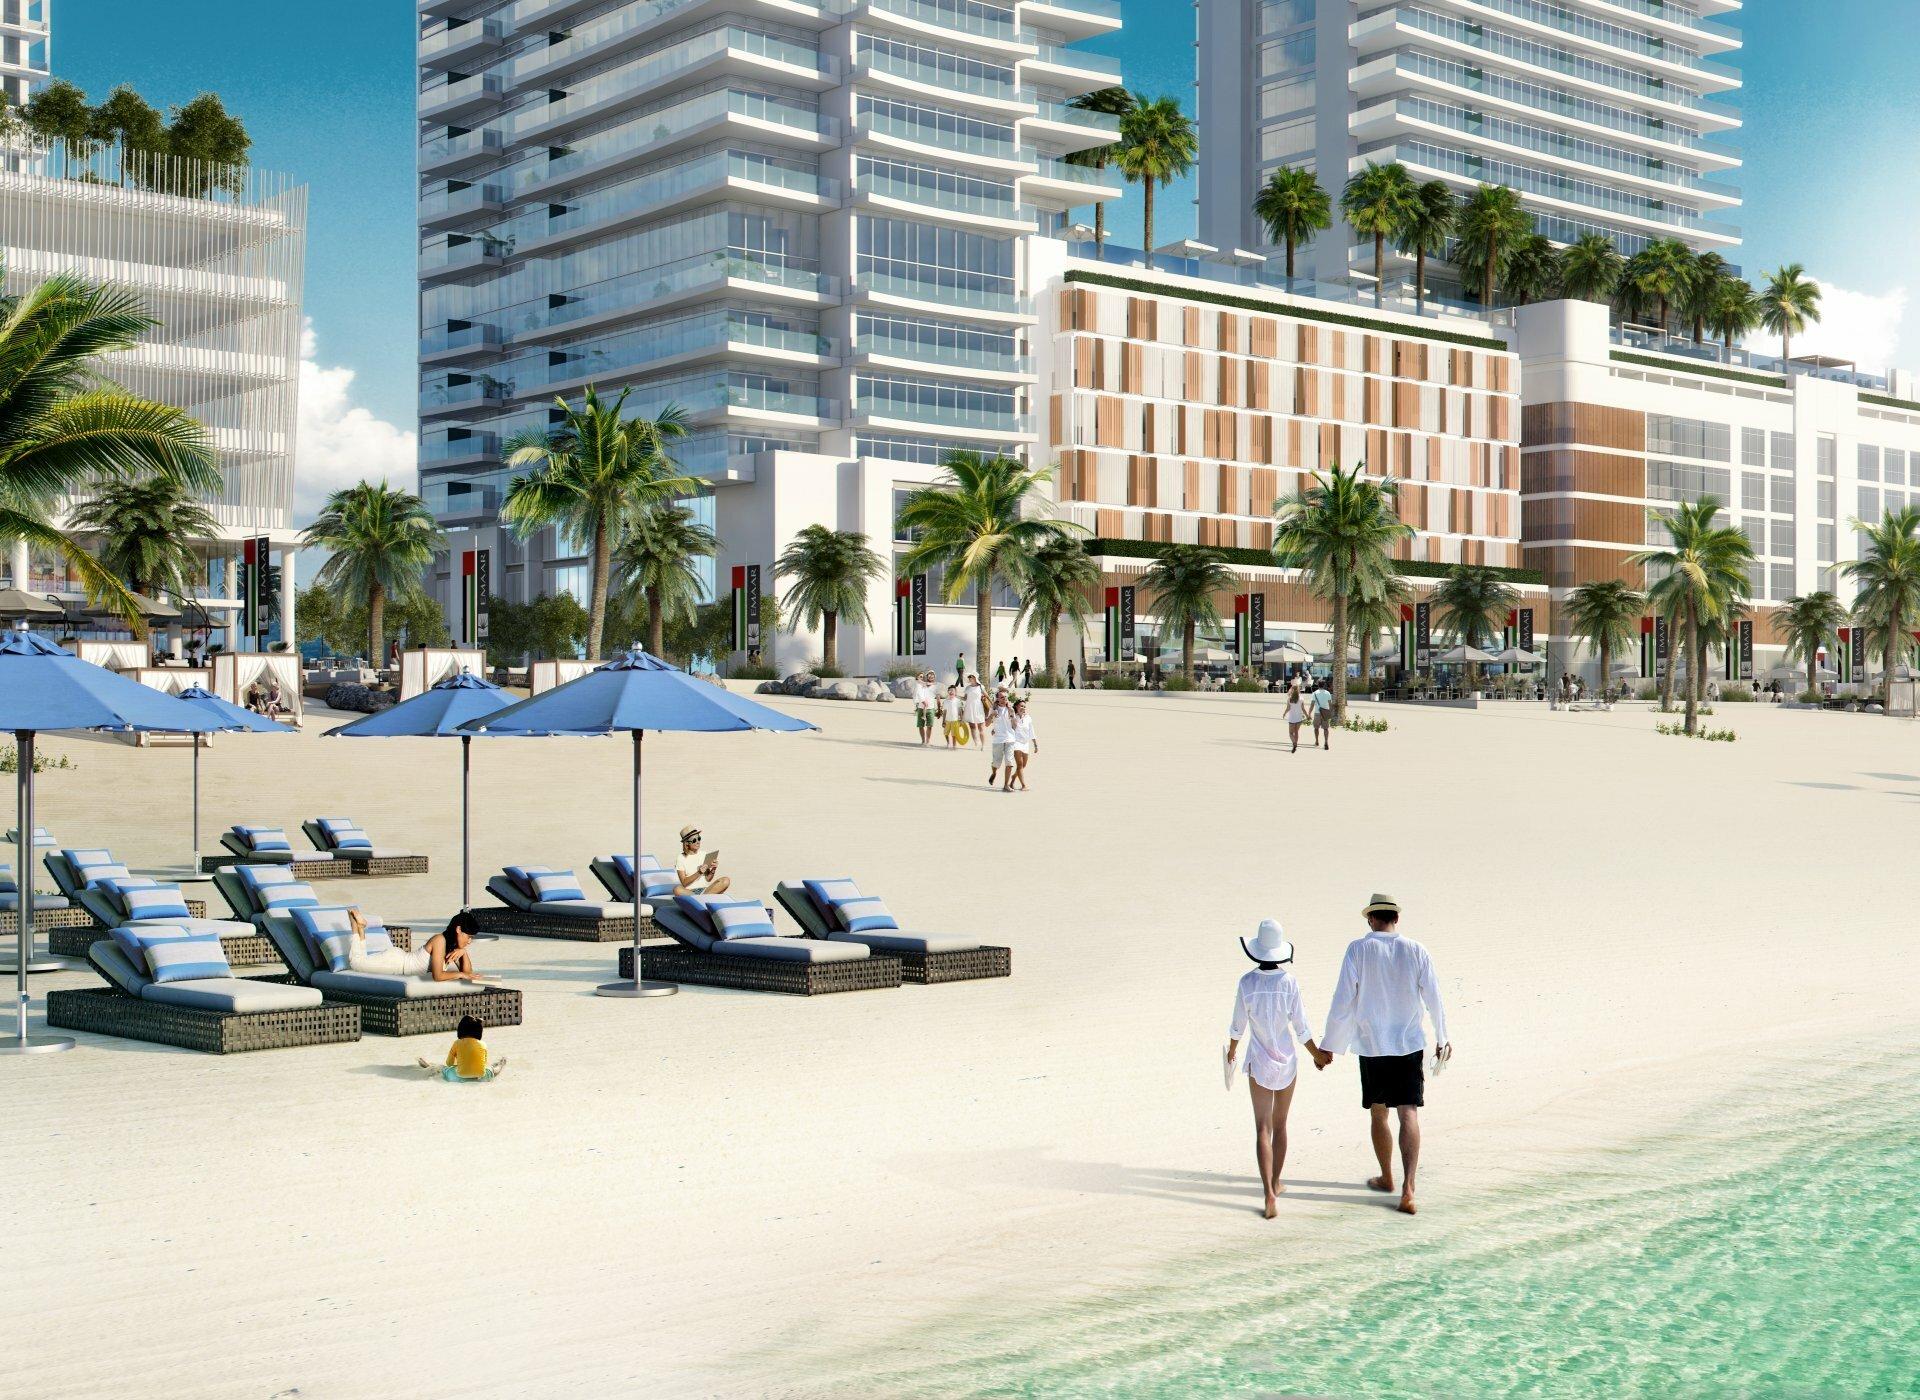 Appartamento a Dubai, Dubai, Emirati Arabi Uniti 1 - 11405355